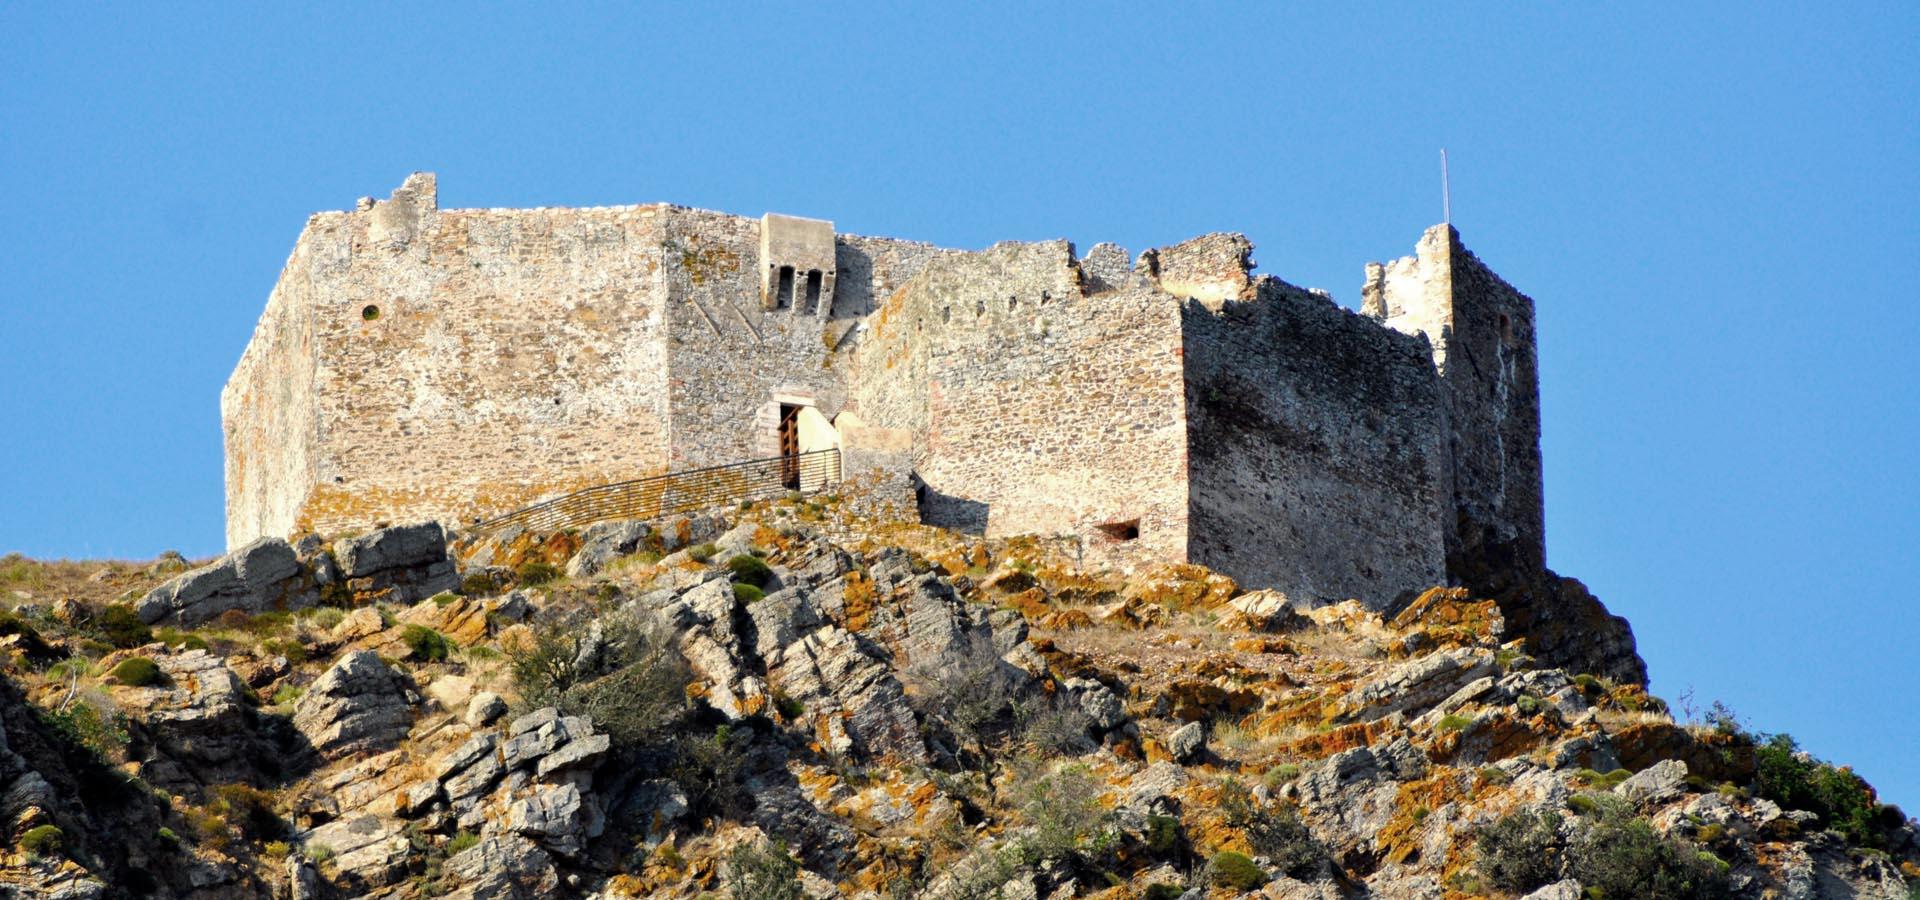 Volterraio Castle